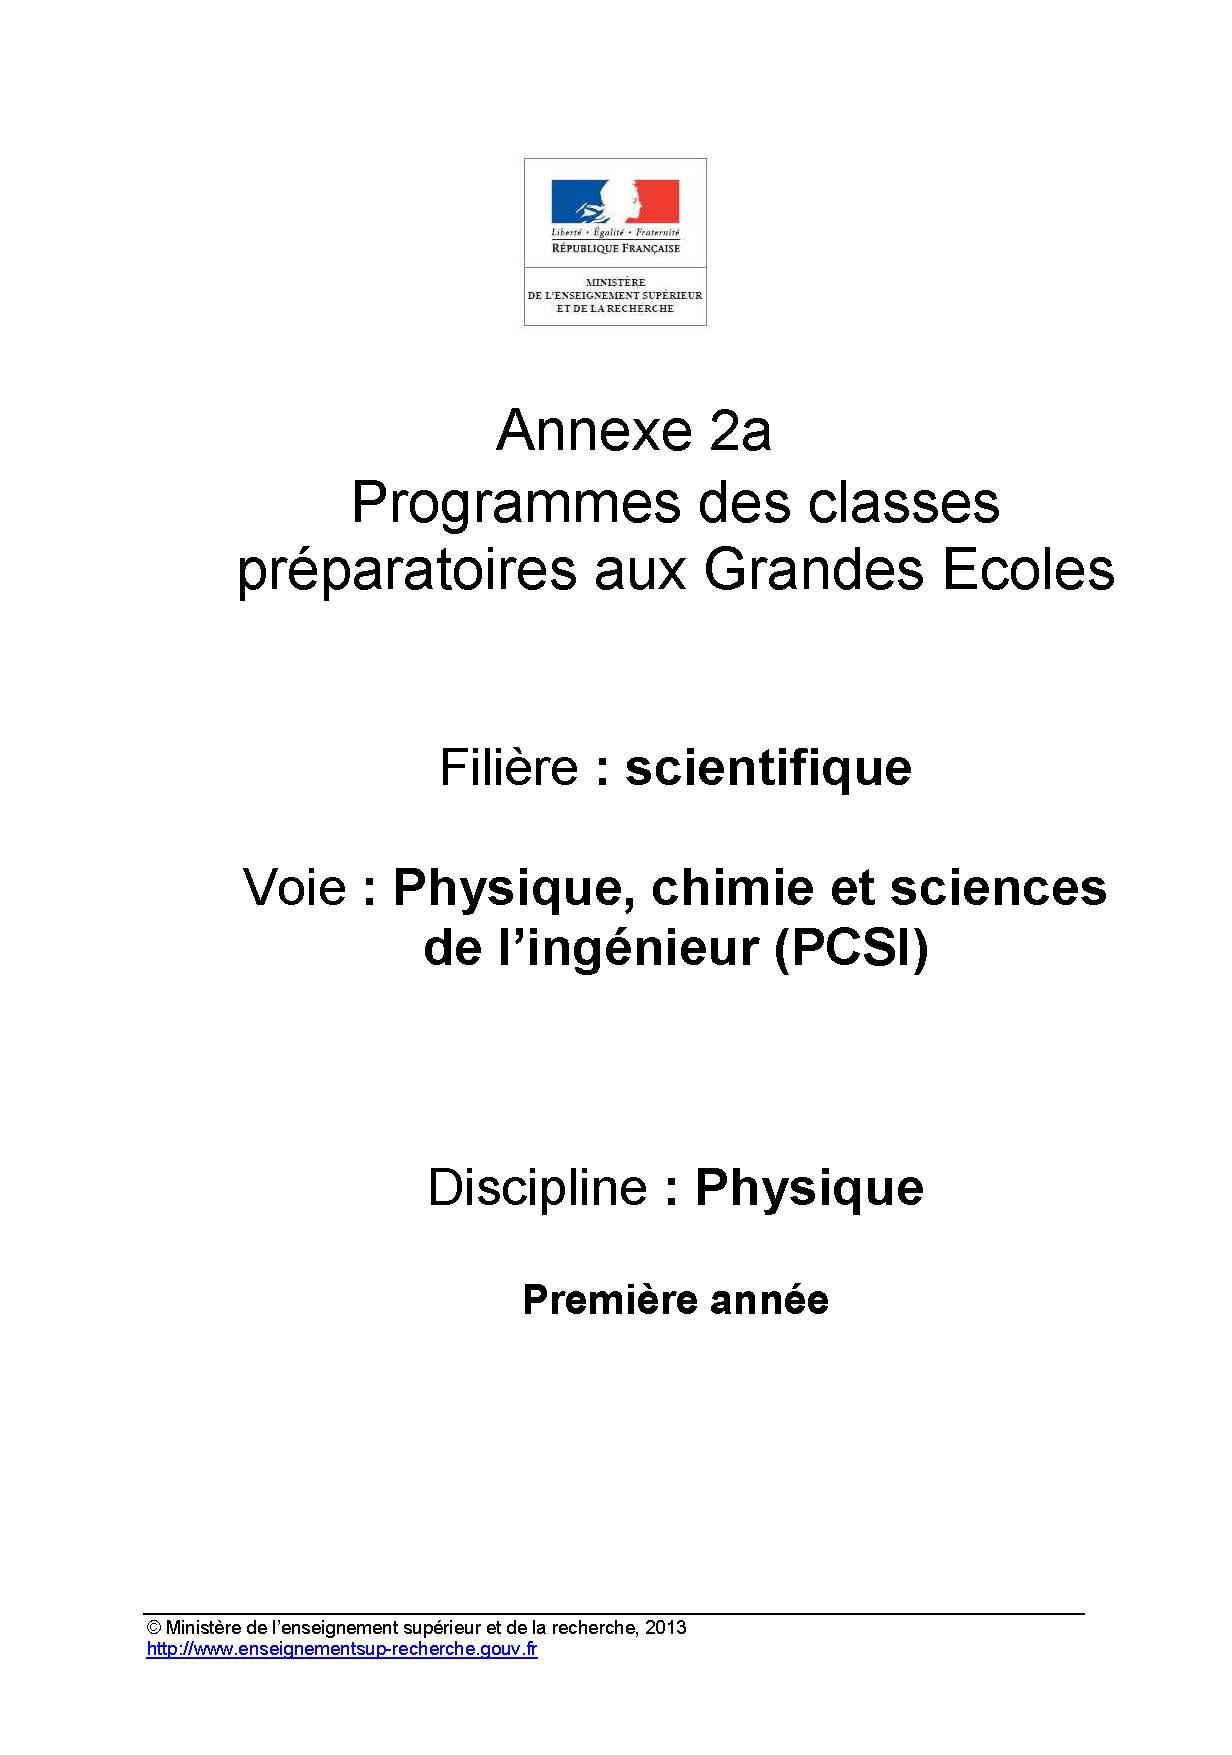 Annexes et programme PCSI